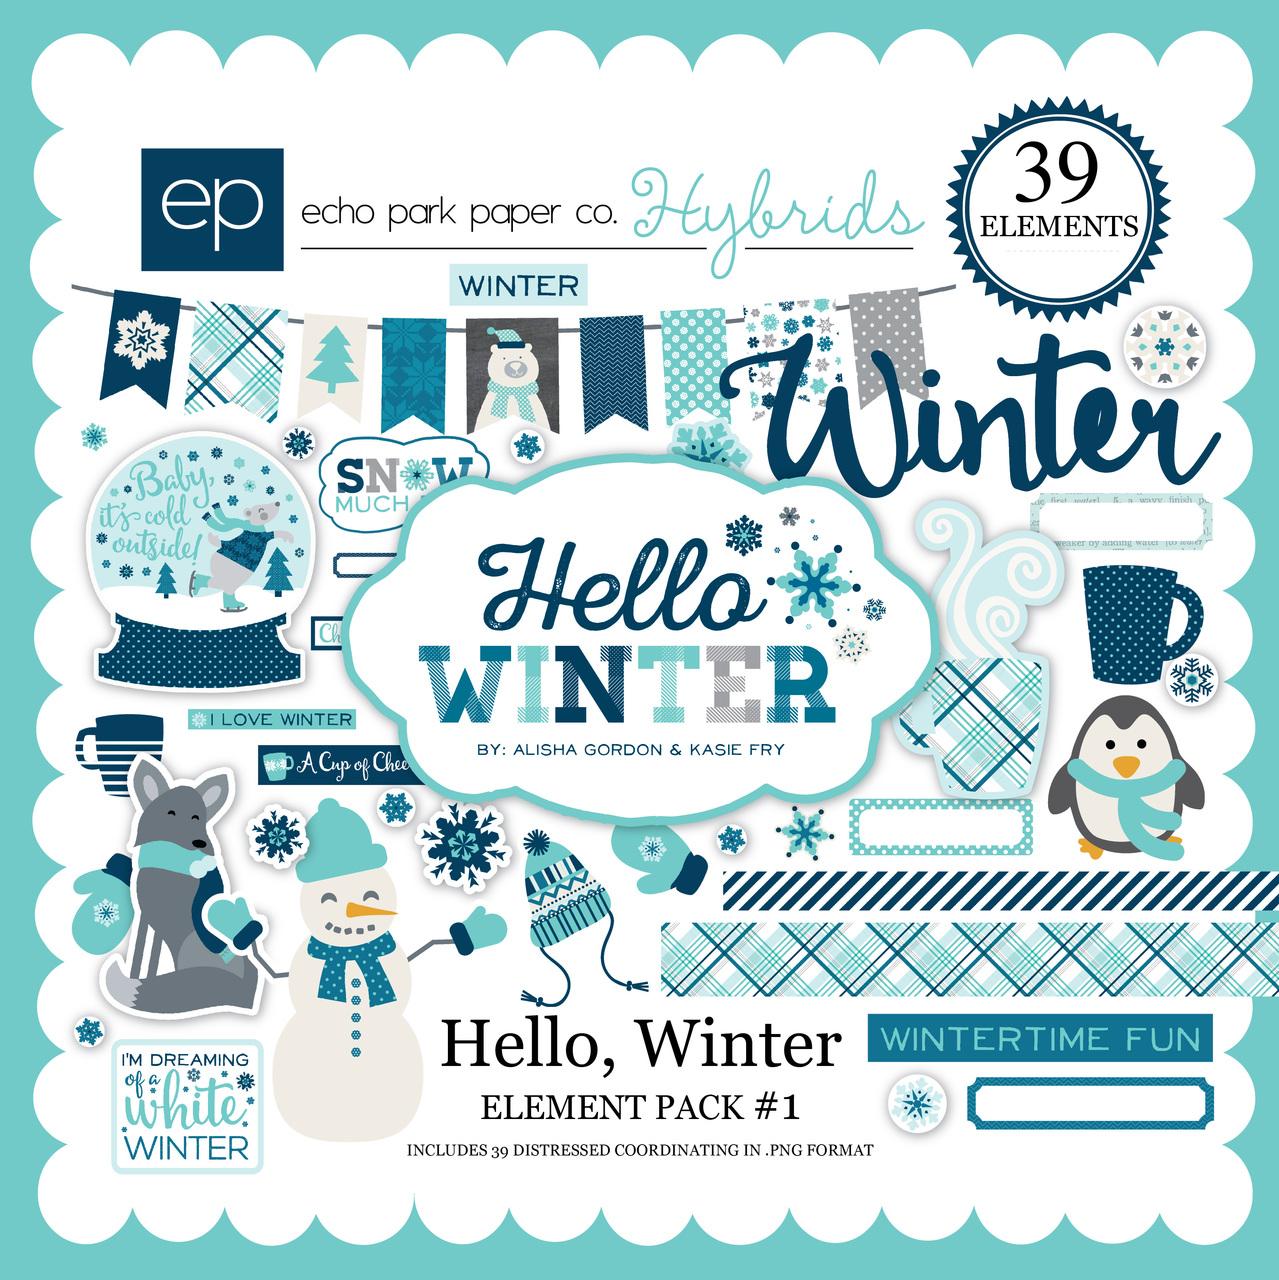 Hello Winter Element Pack 1